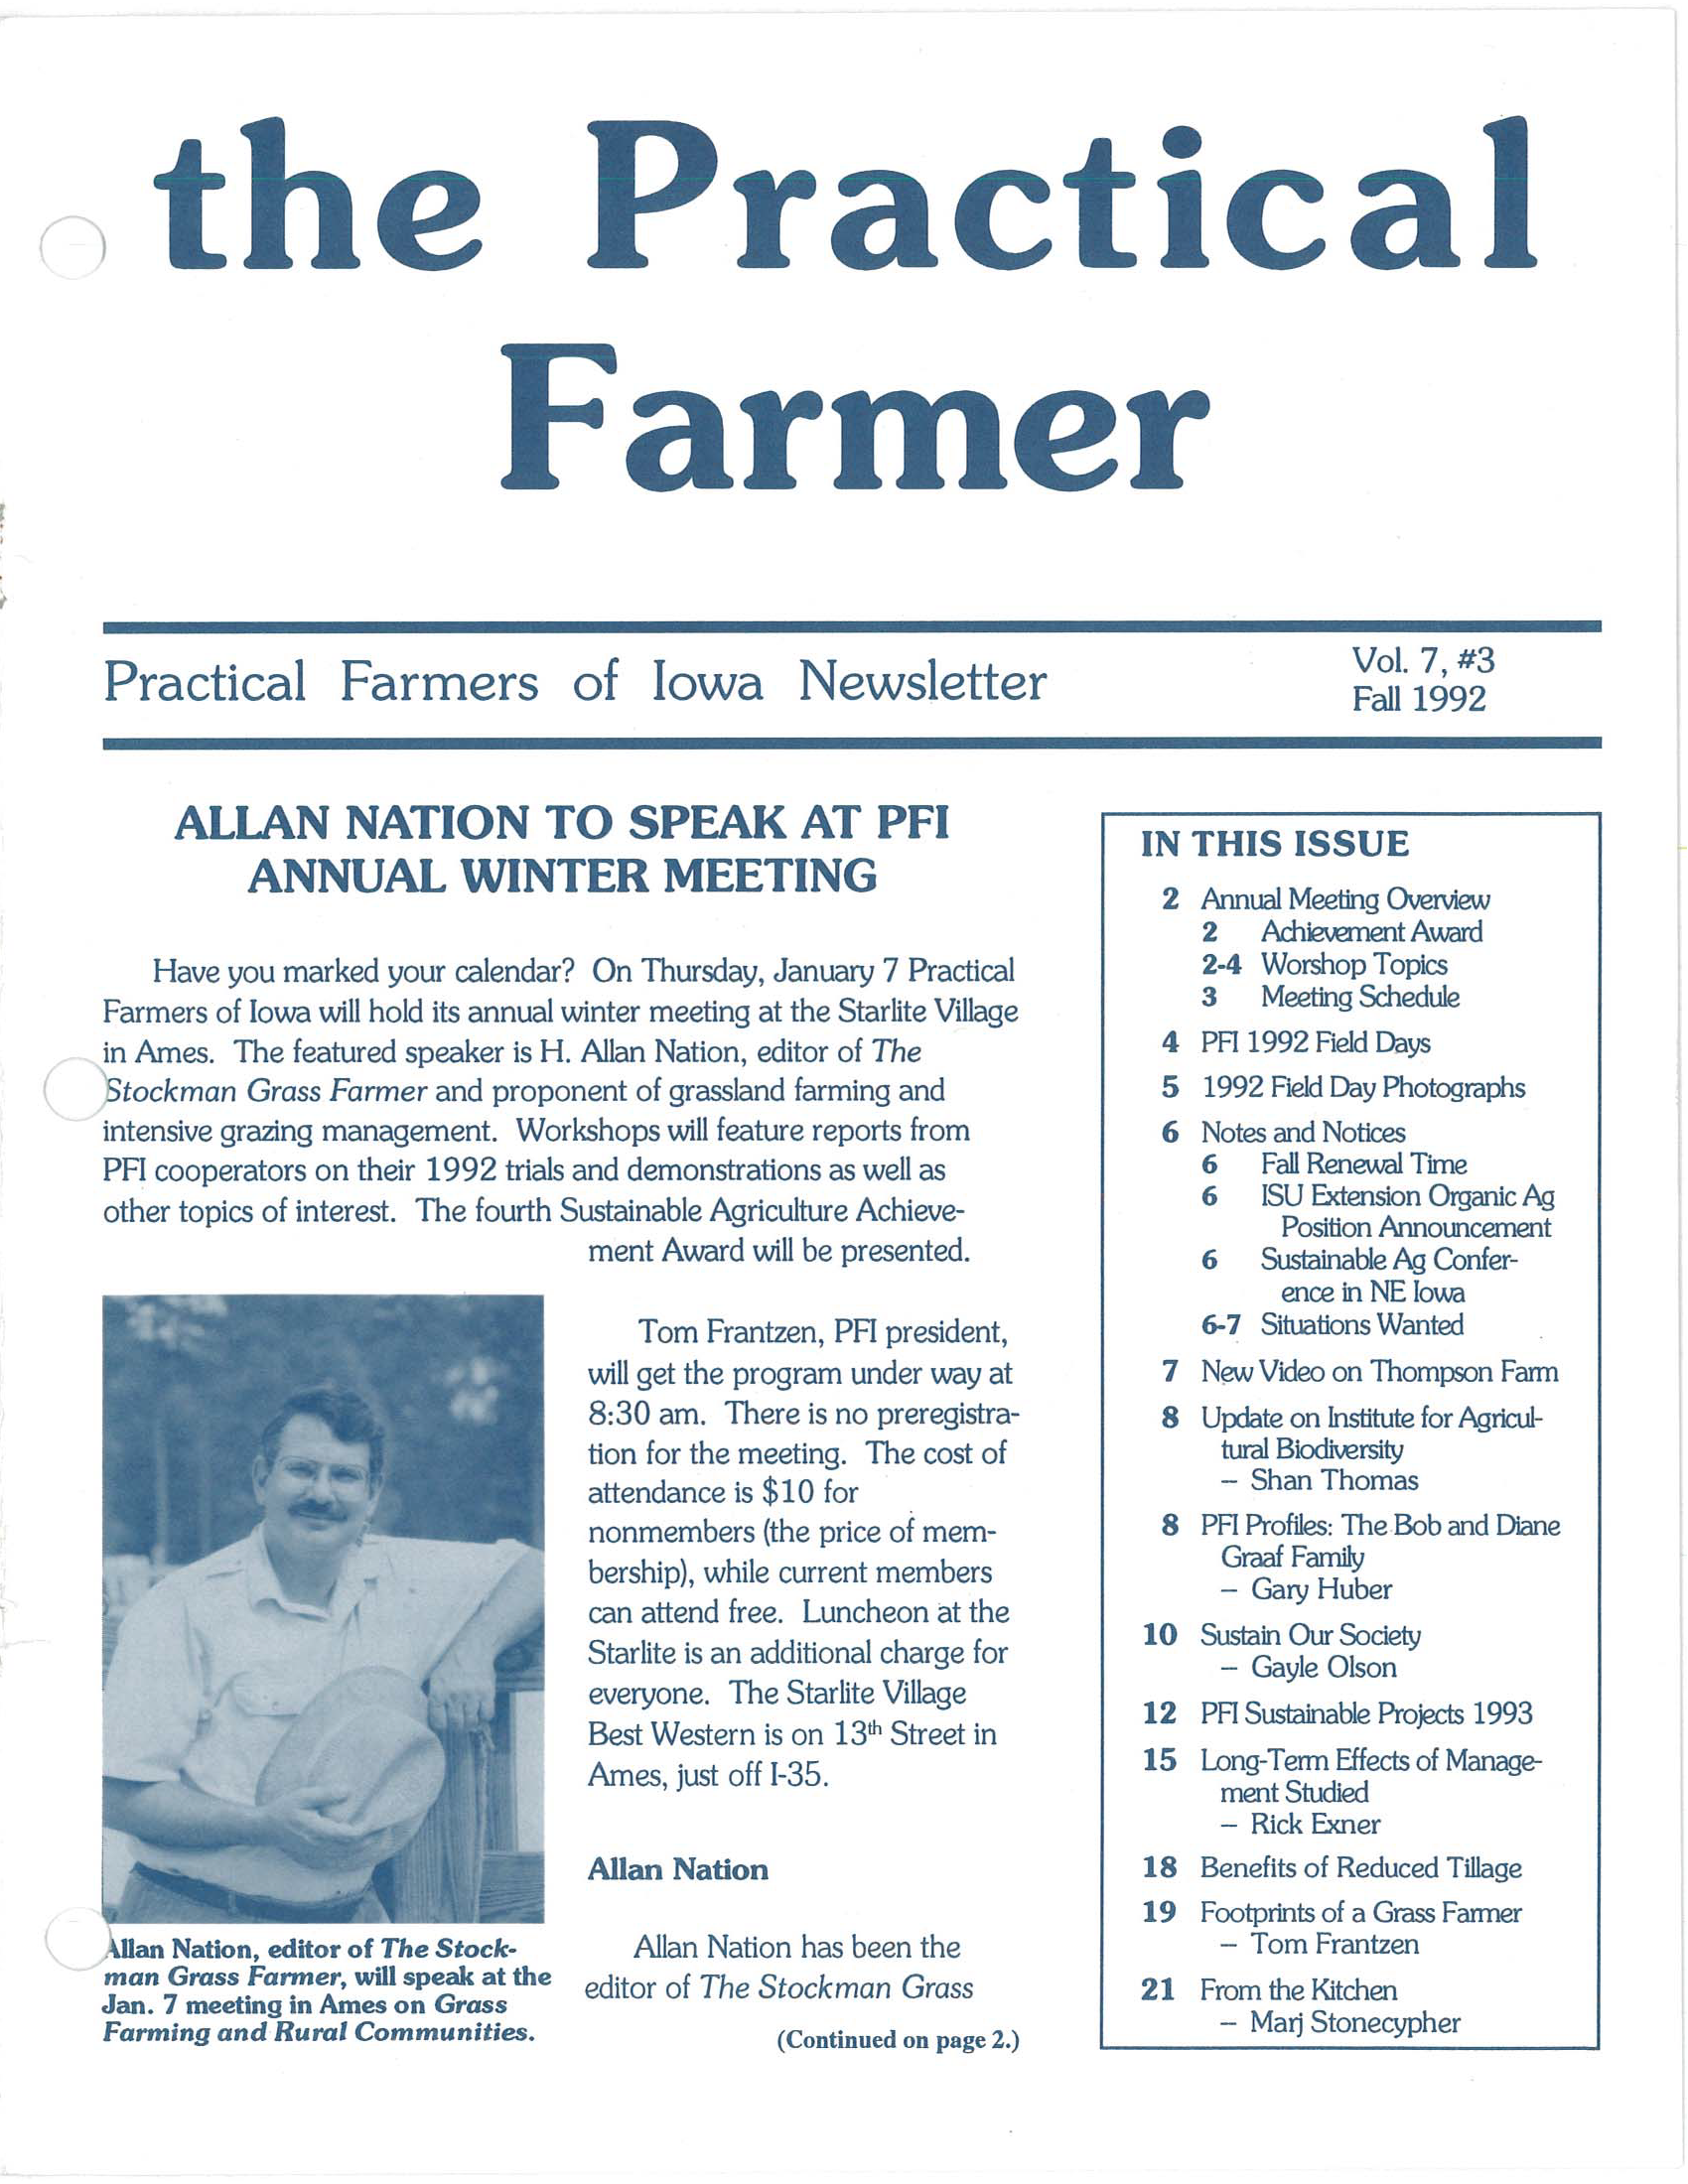 The Practical Farmer: Fall 1992 - Practical Farmers of Iowa